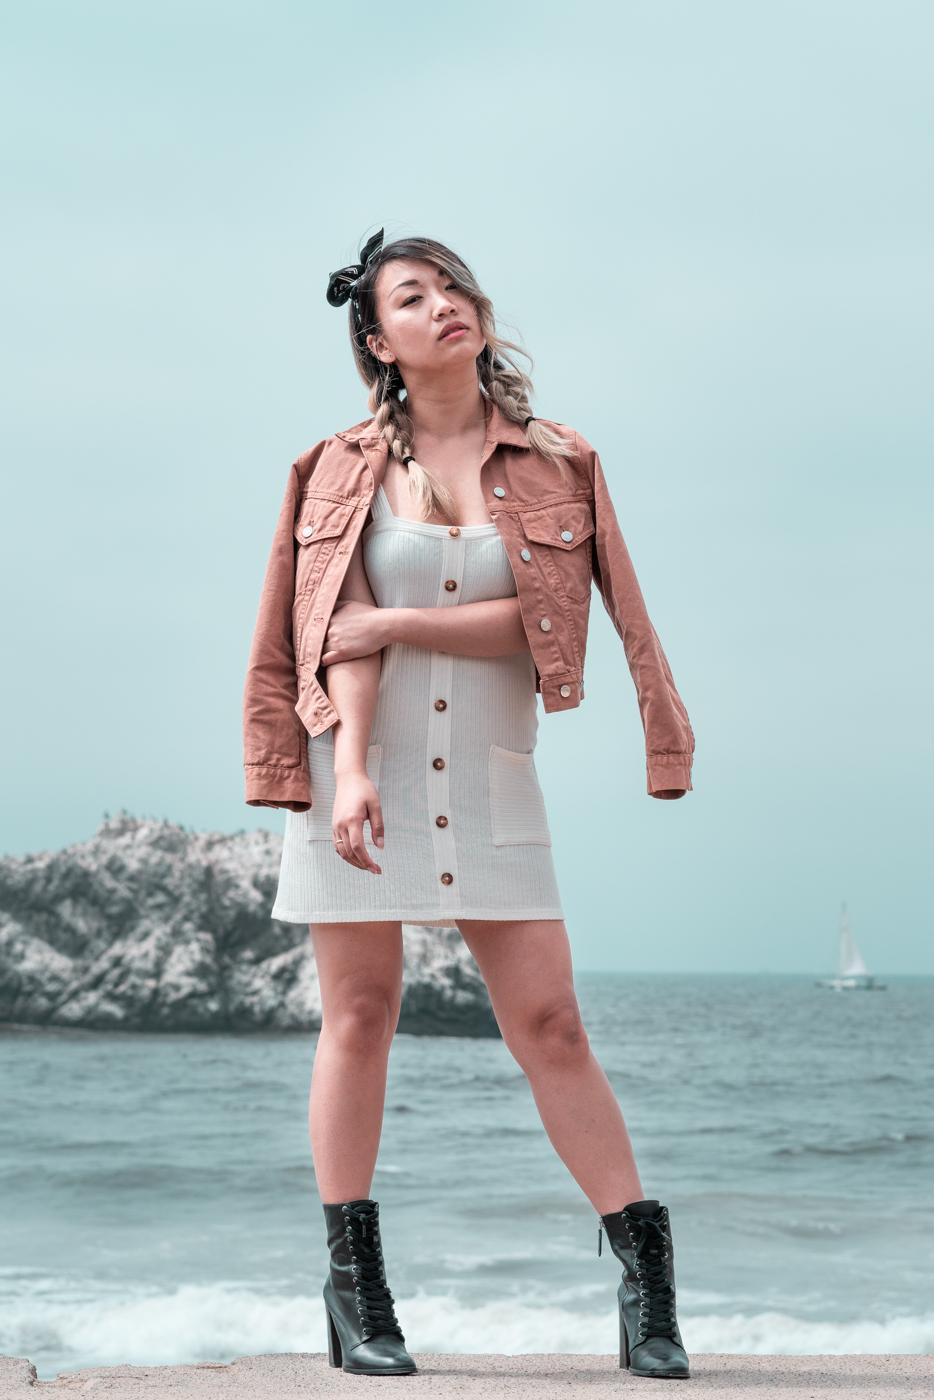 Reformation Dress & Schutz Makayla Booties   The Chic Diary